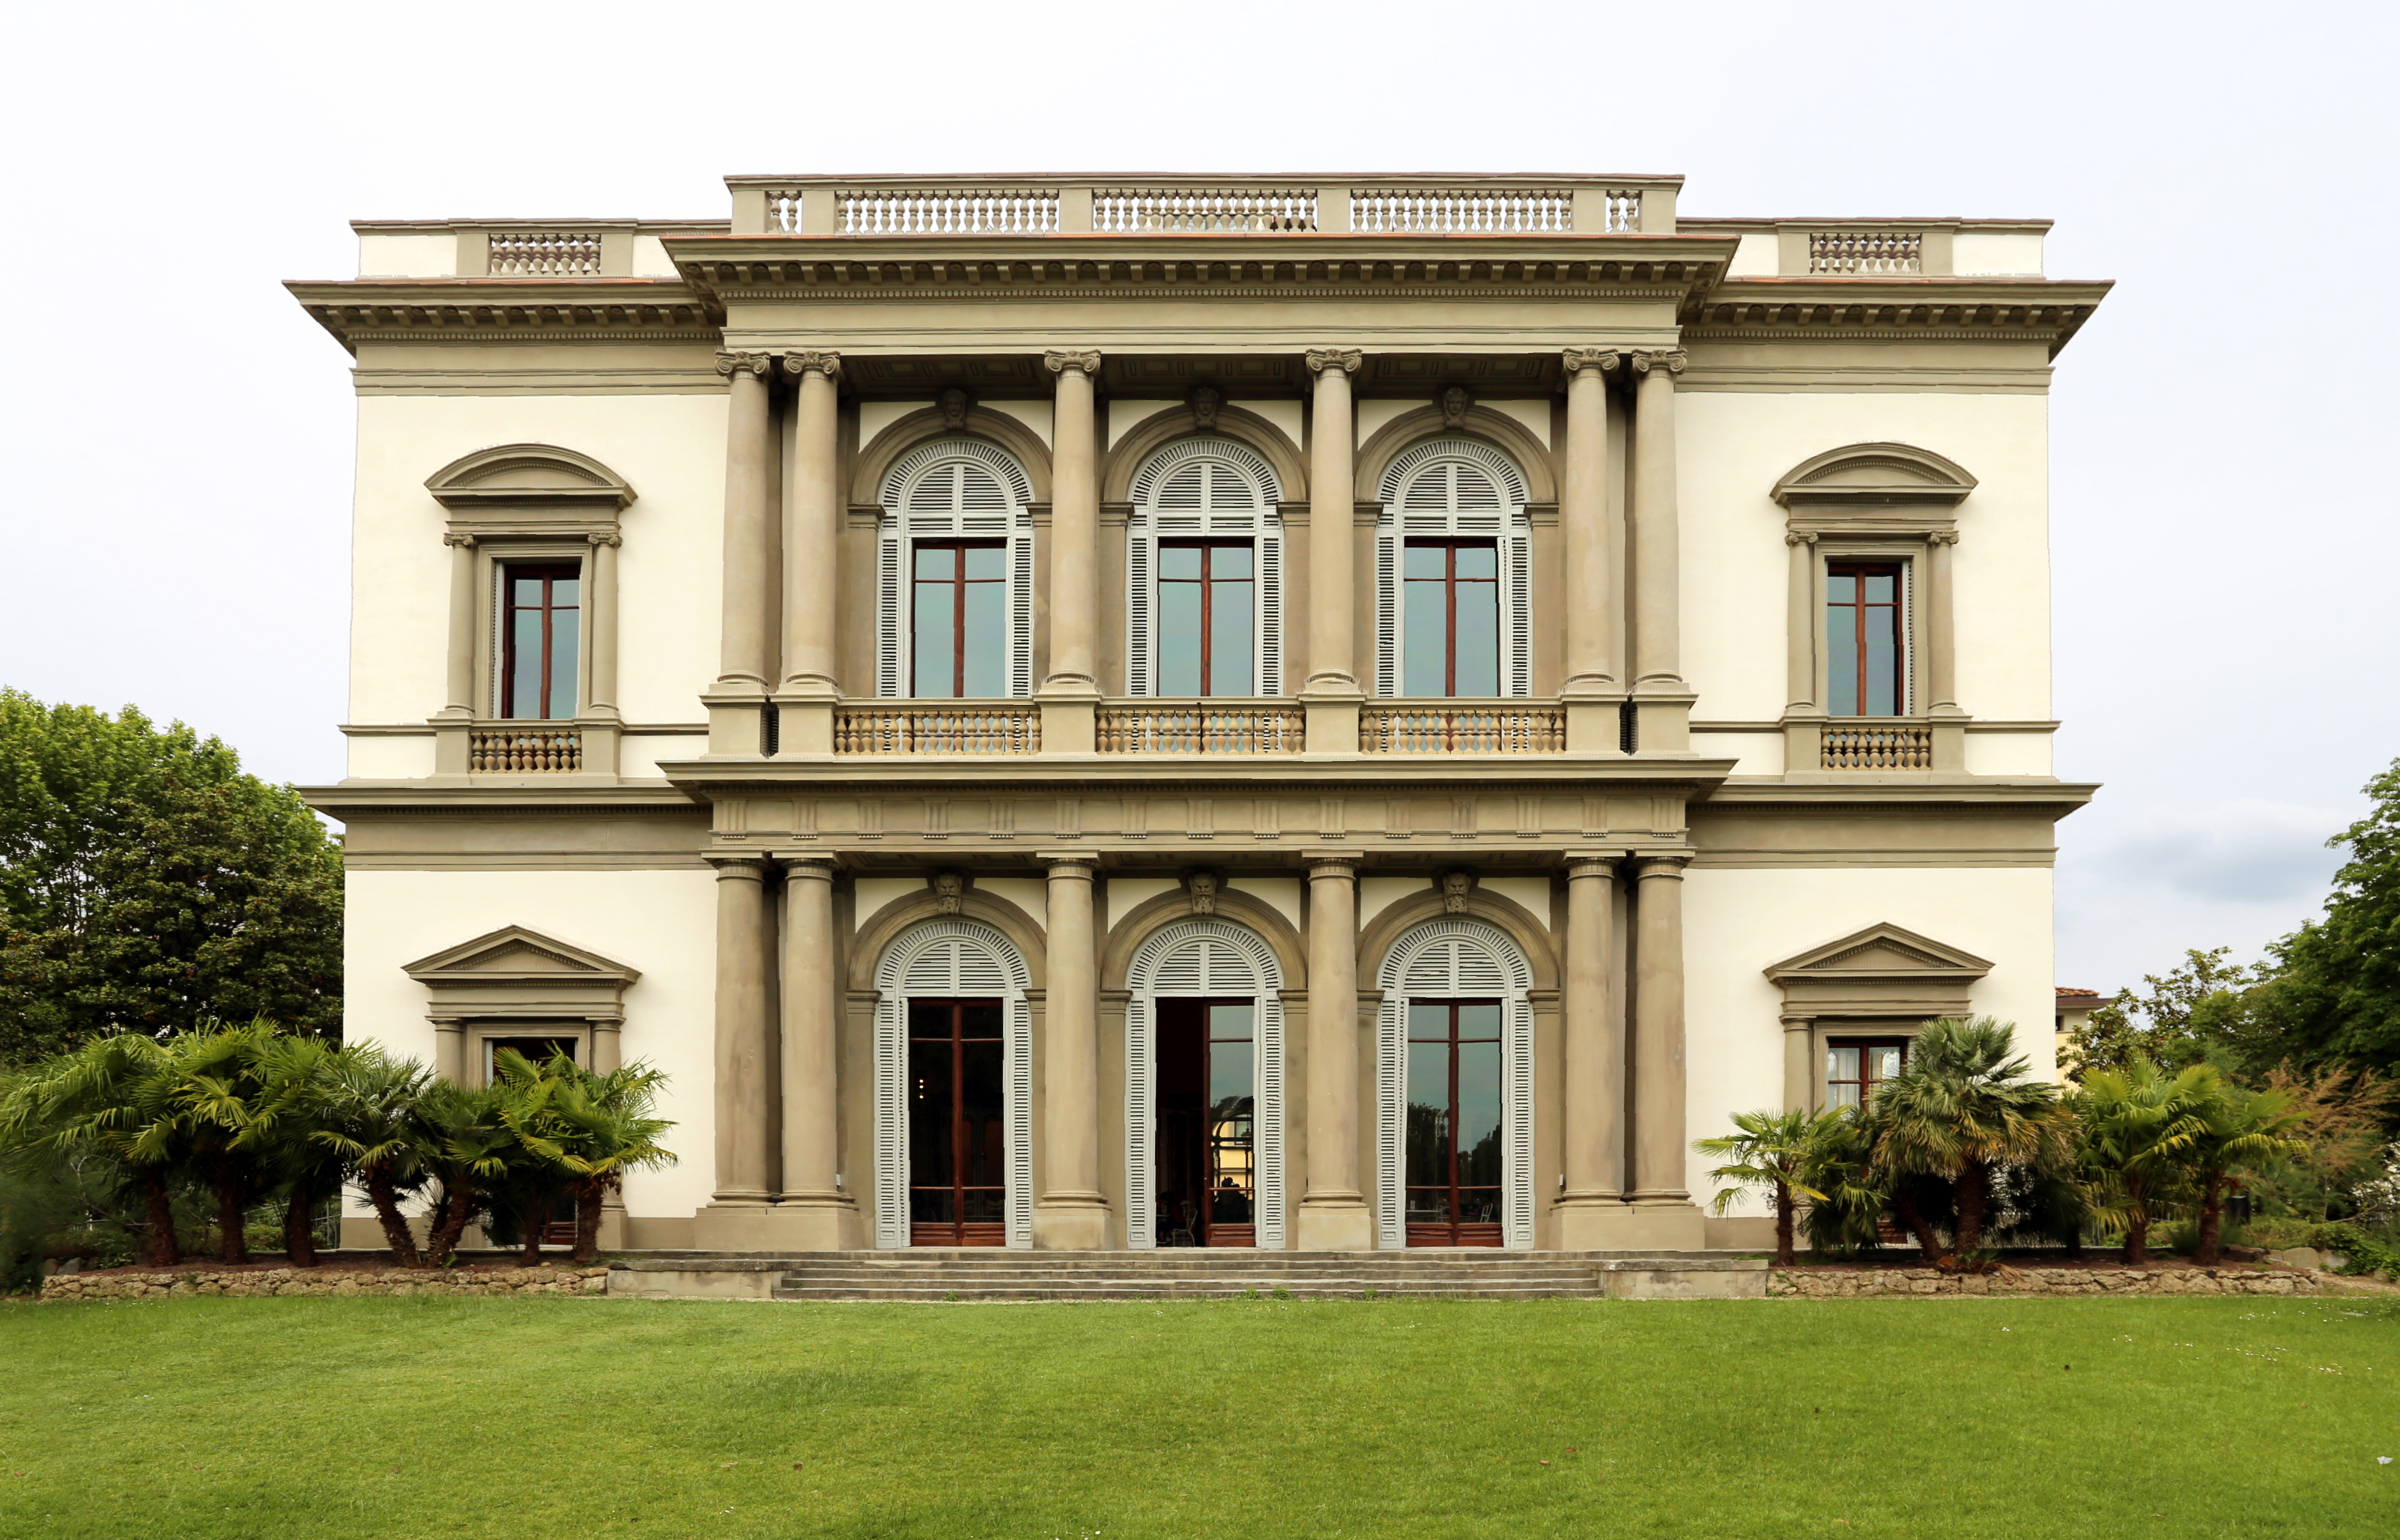 Villa Favard - Wikipedia